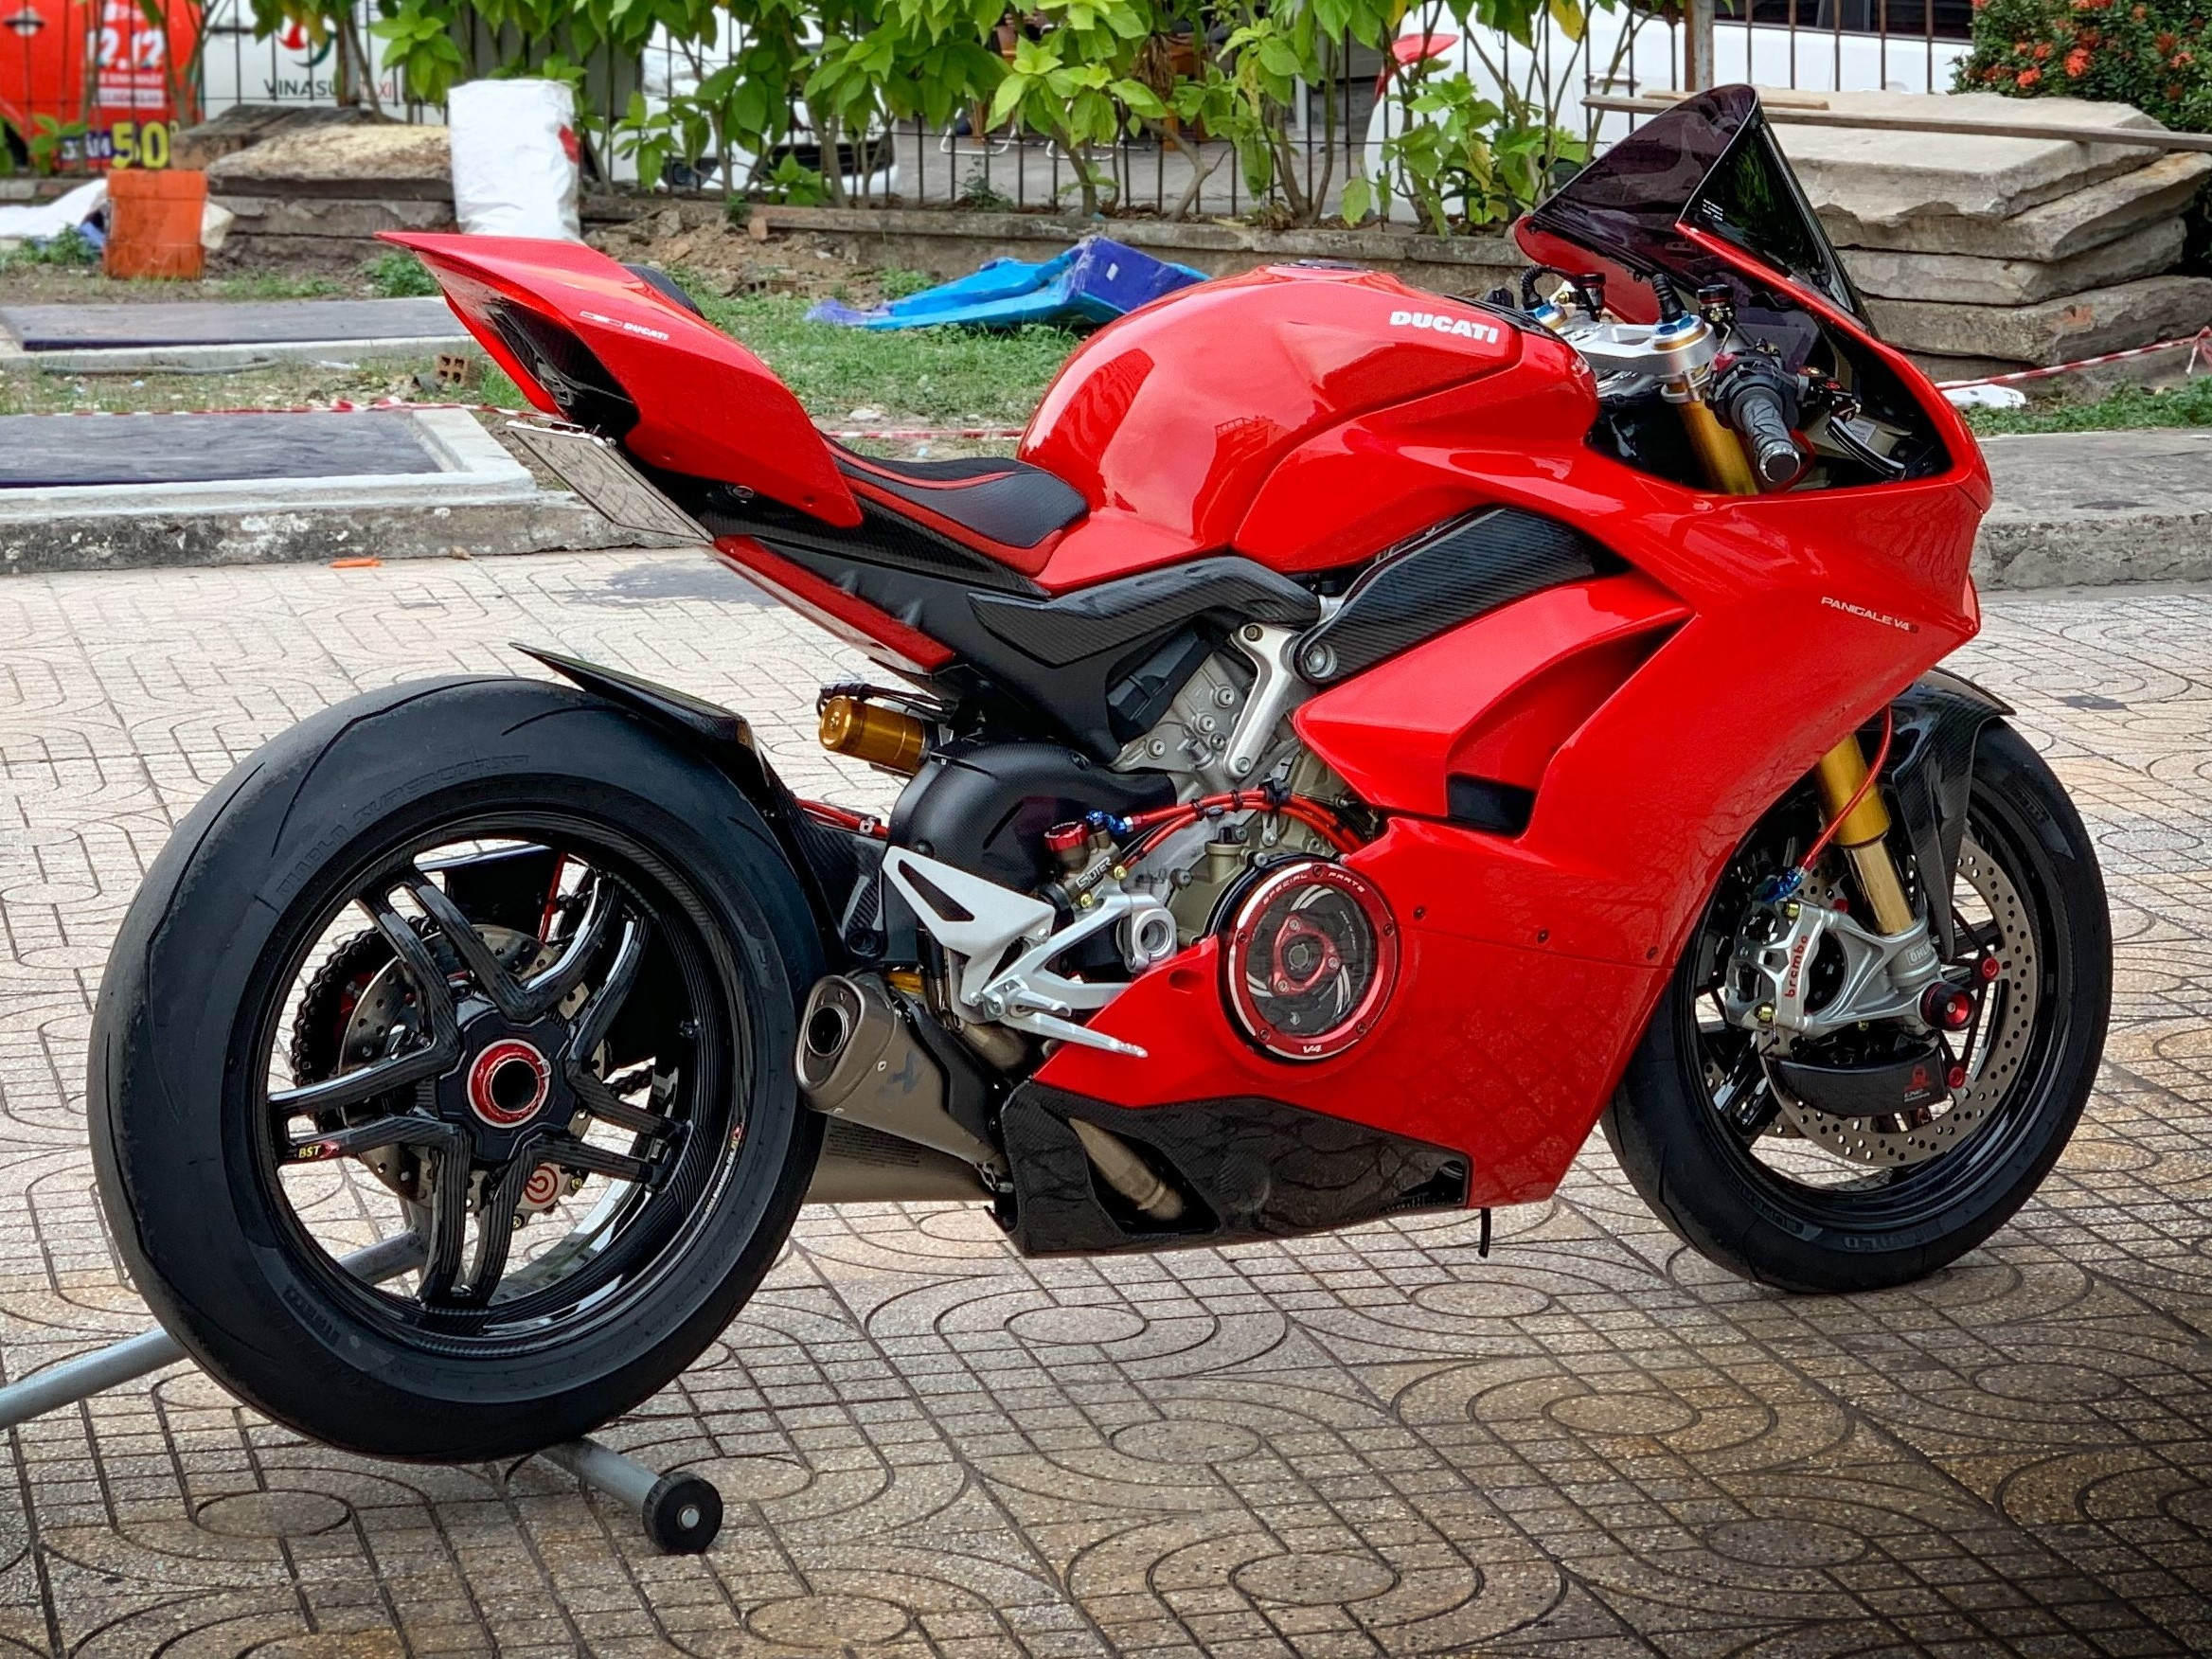 Moto tien ty Ducati Panigale V4 S voi goi do dat gia tai TP.HCM hinh anh 6 V4_8.jpeg